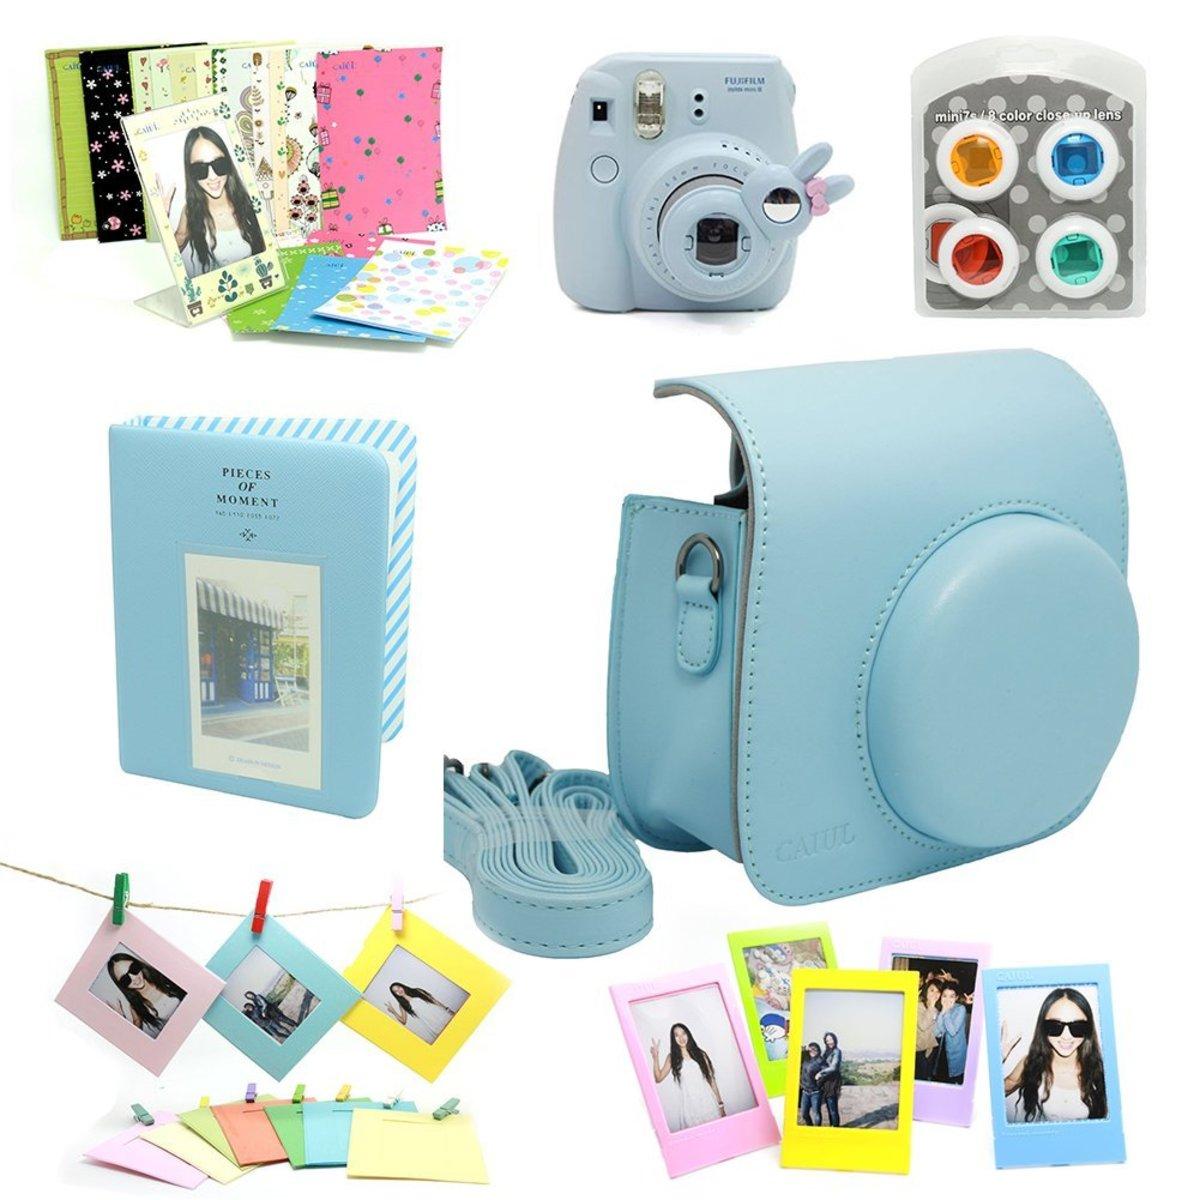 Fujifilm Instax Mini 8 Instant Film Camera Accessory Bundle